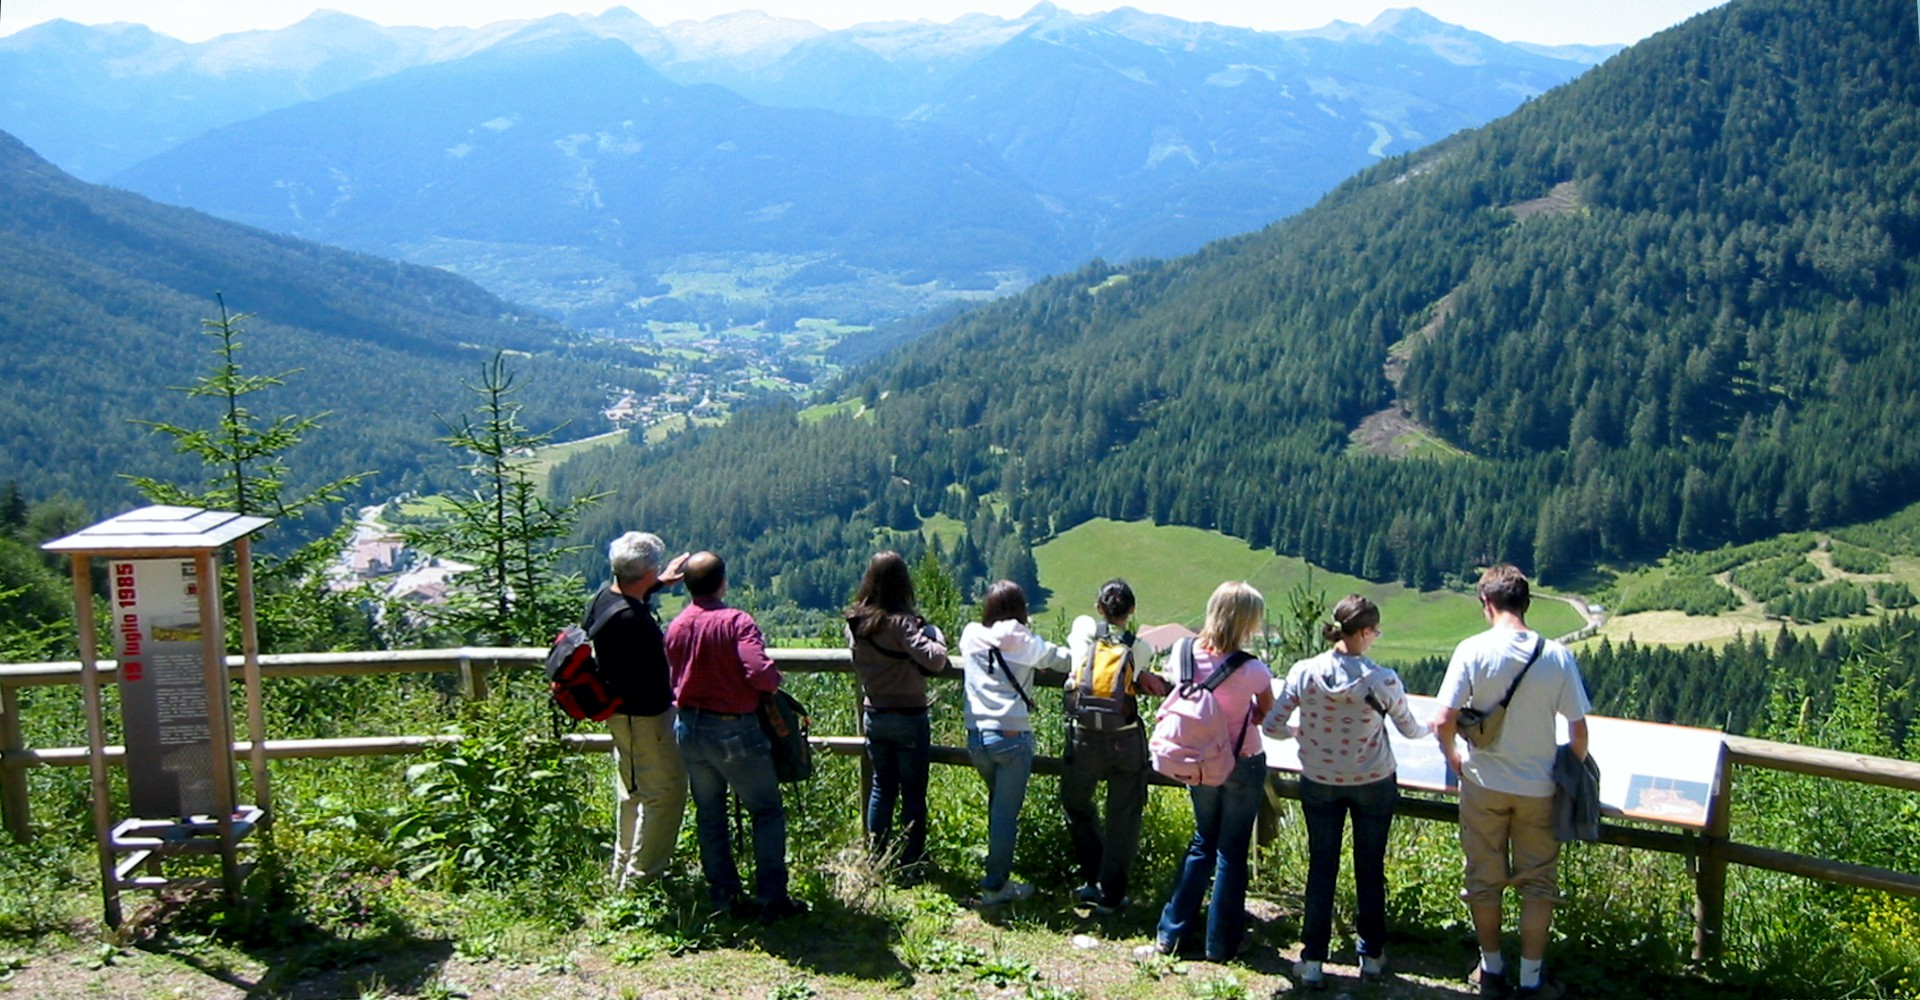 Il punto panoramico a quota 1500 m. sul Sentiero Stava 1985